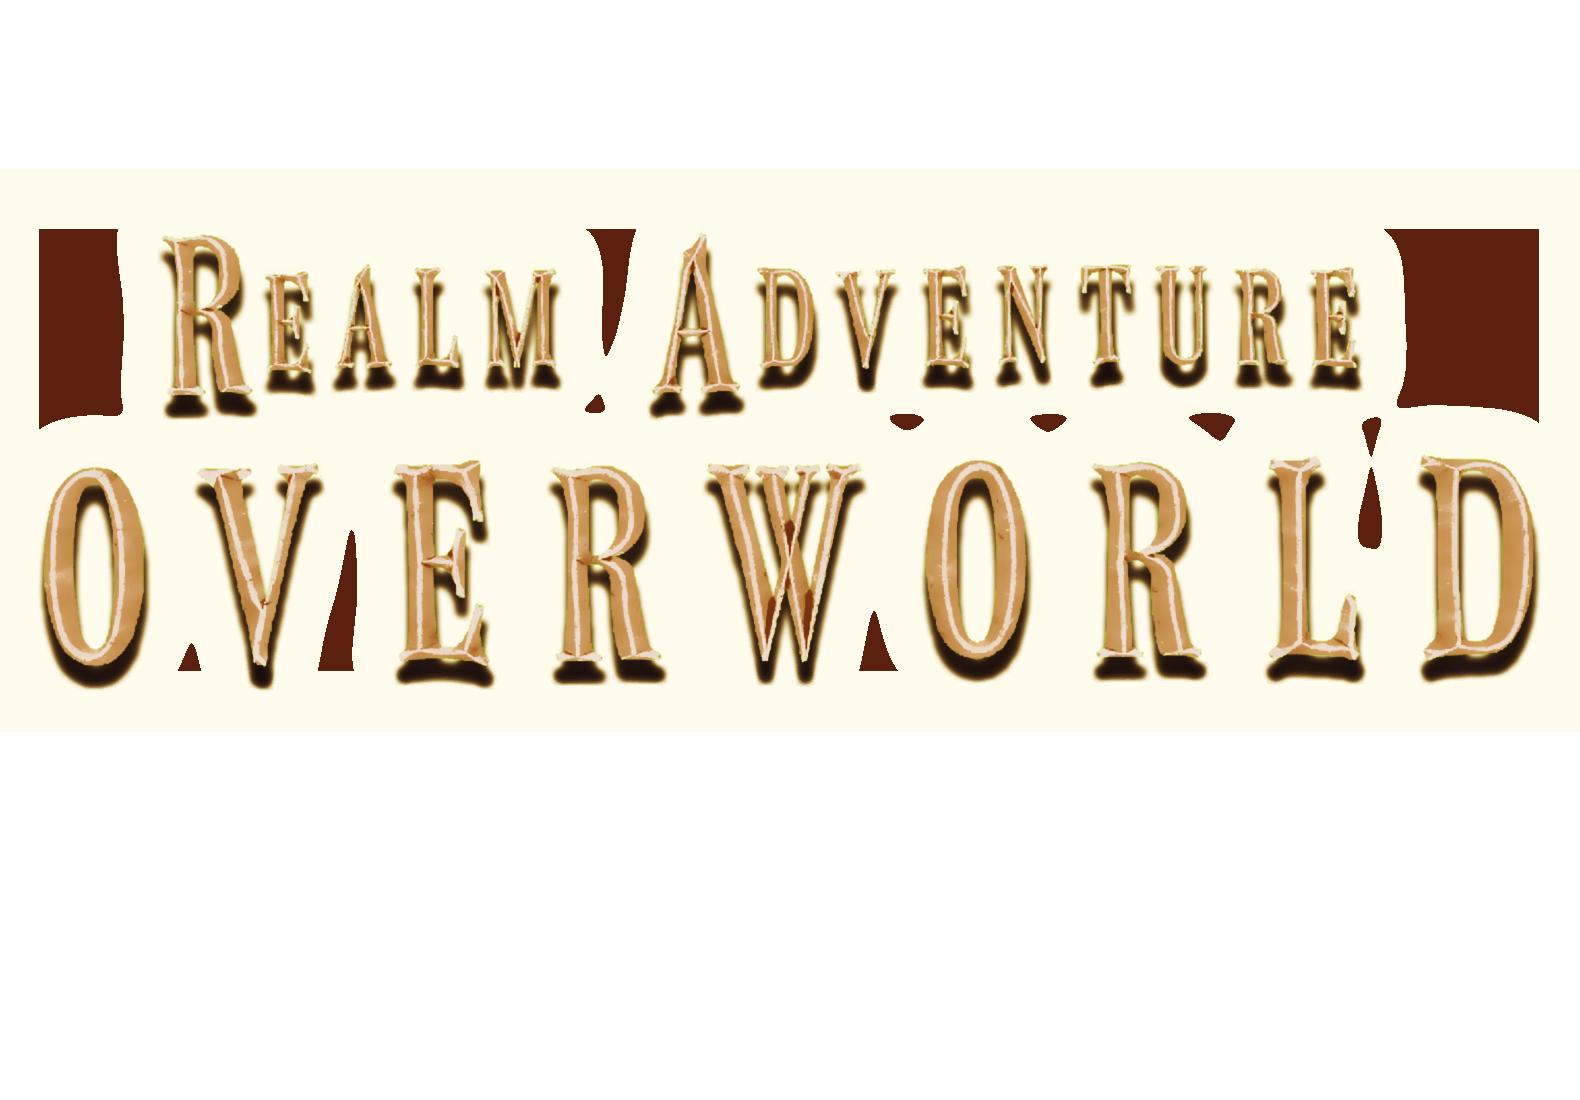 Realm Adventure